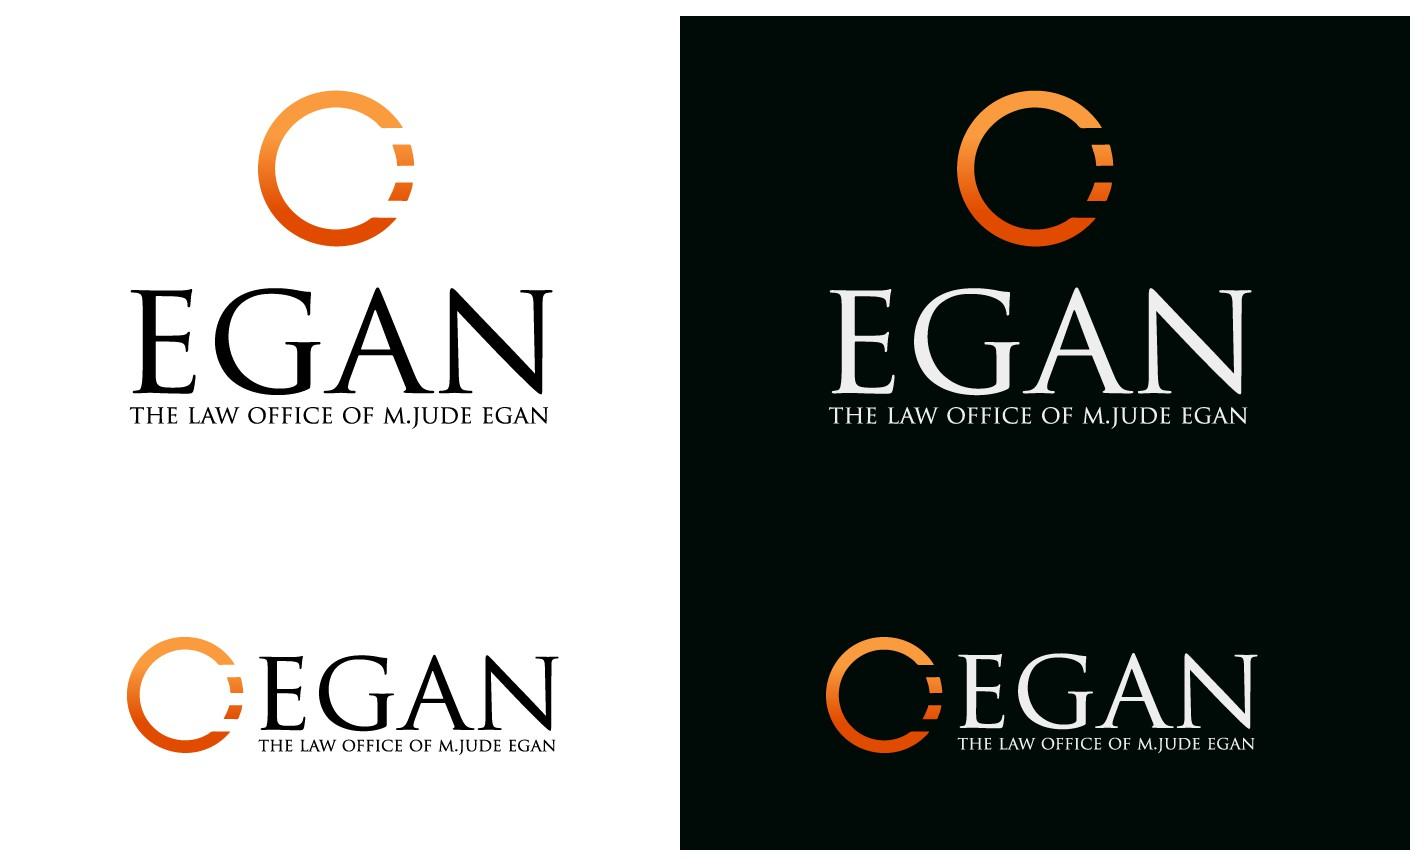 Help E- Egan with a new logo